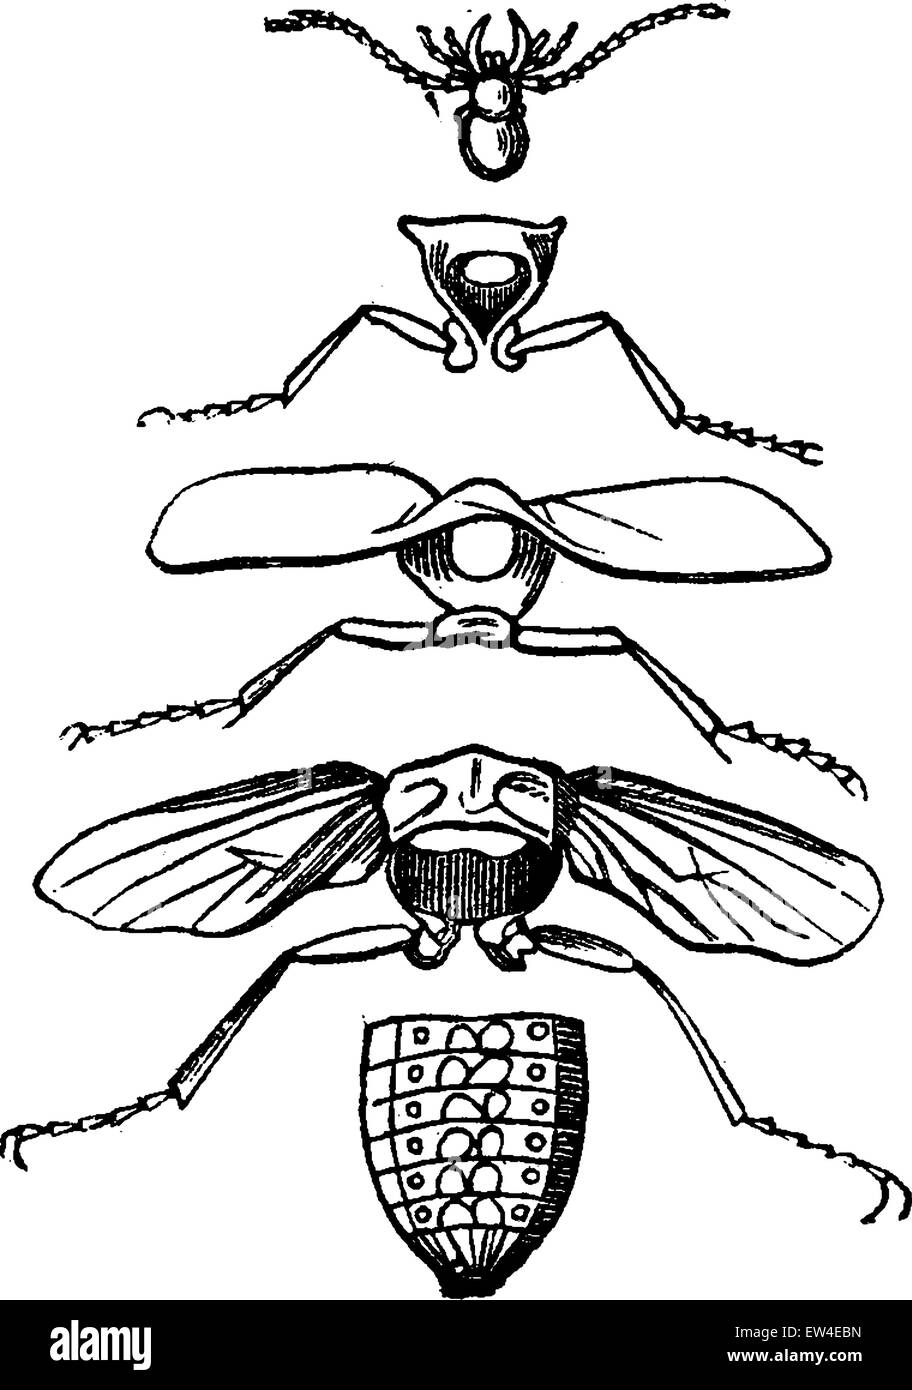 Körperteile eines Insekts, graviert Vintage Illustration. La Vie Dans la Nature, 1890. Stockbild